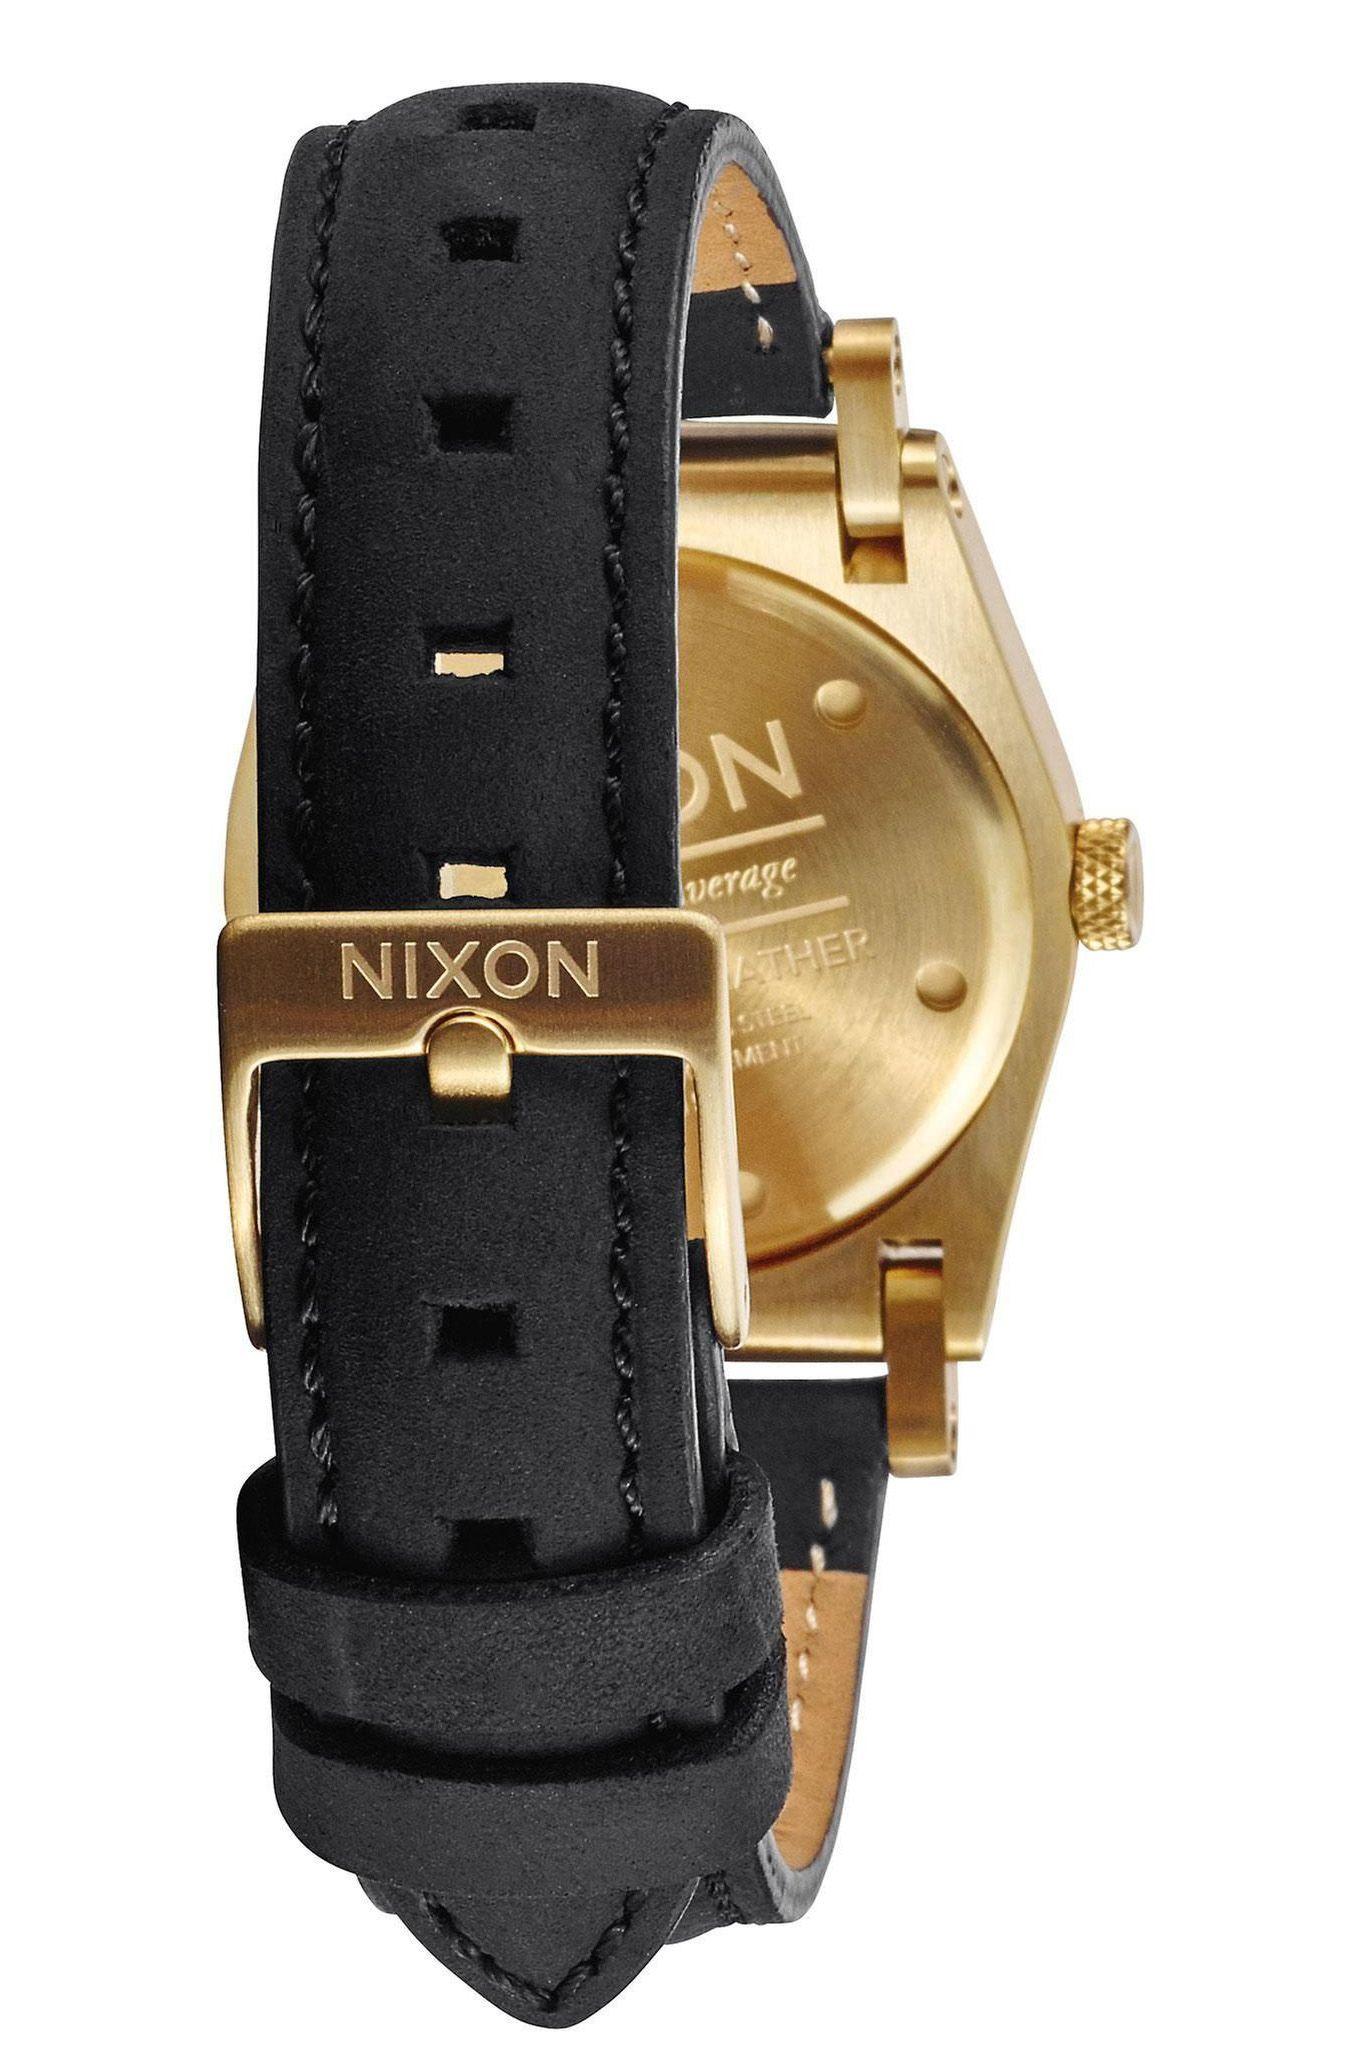 Relogio Nixon JANE LEATHER Gold/Black